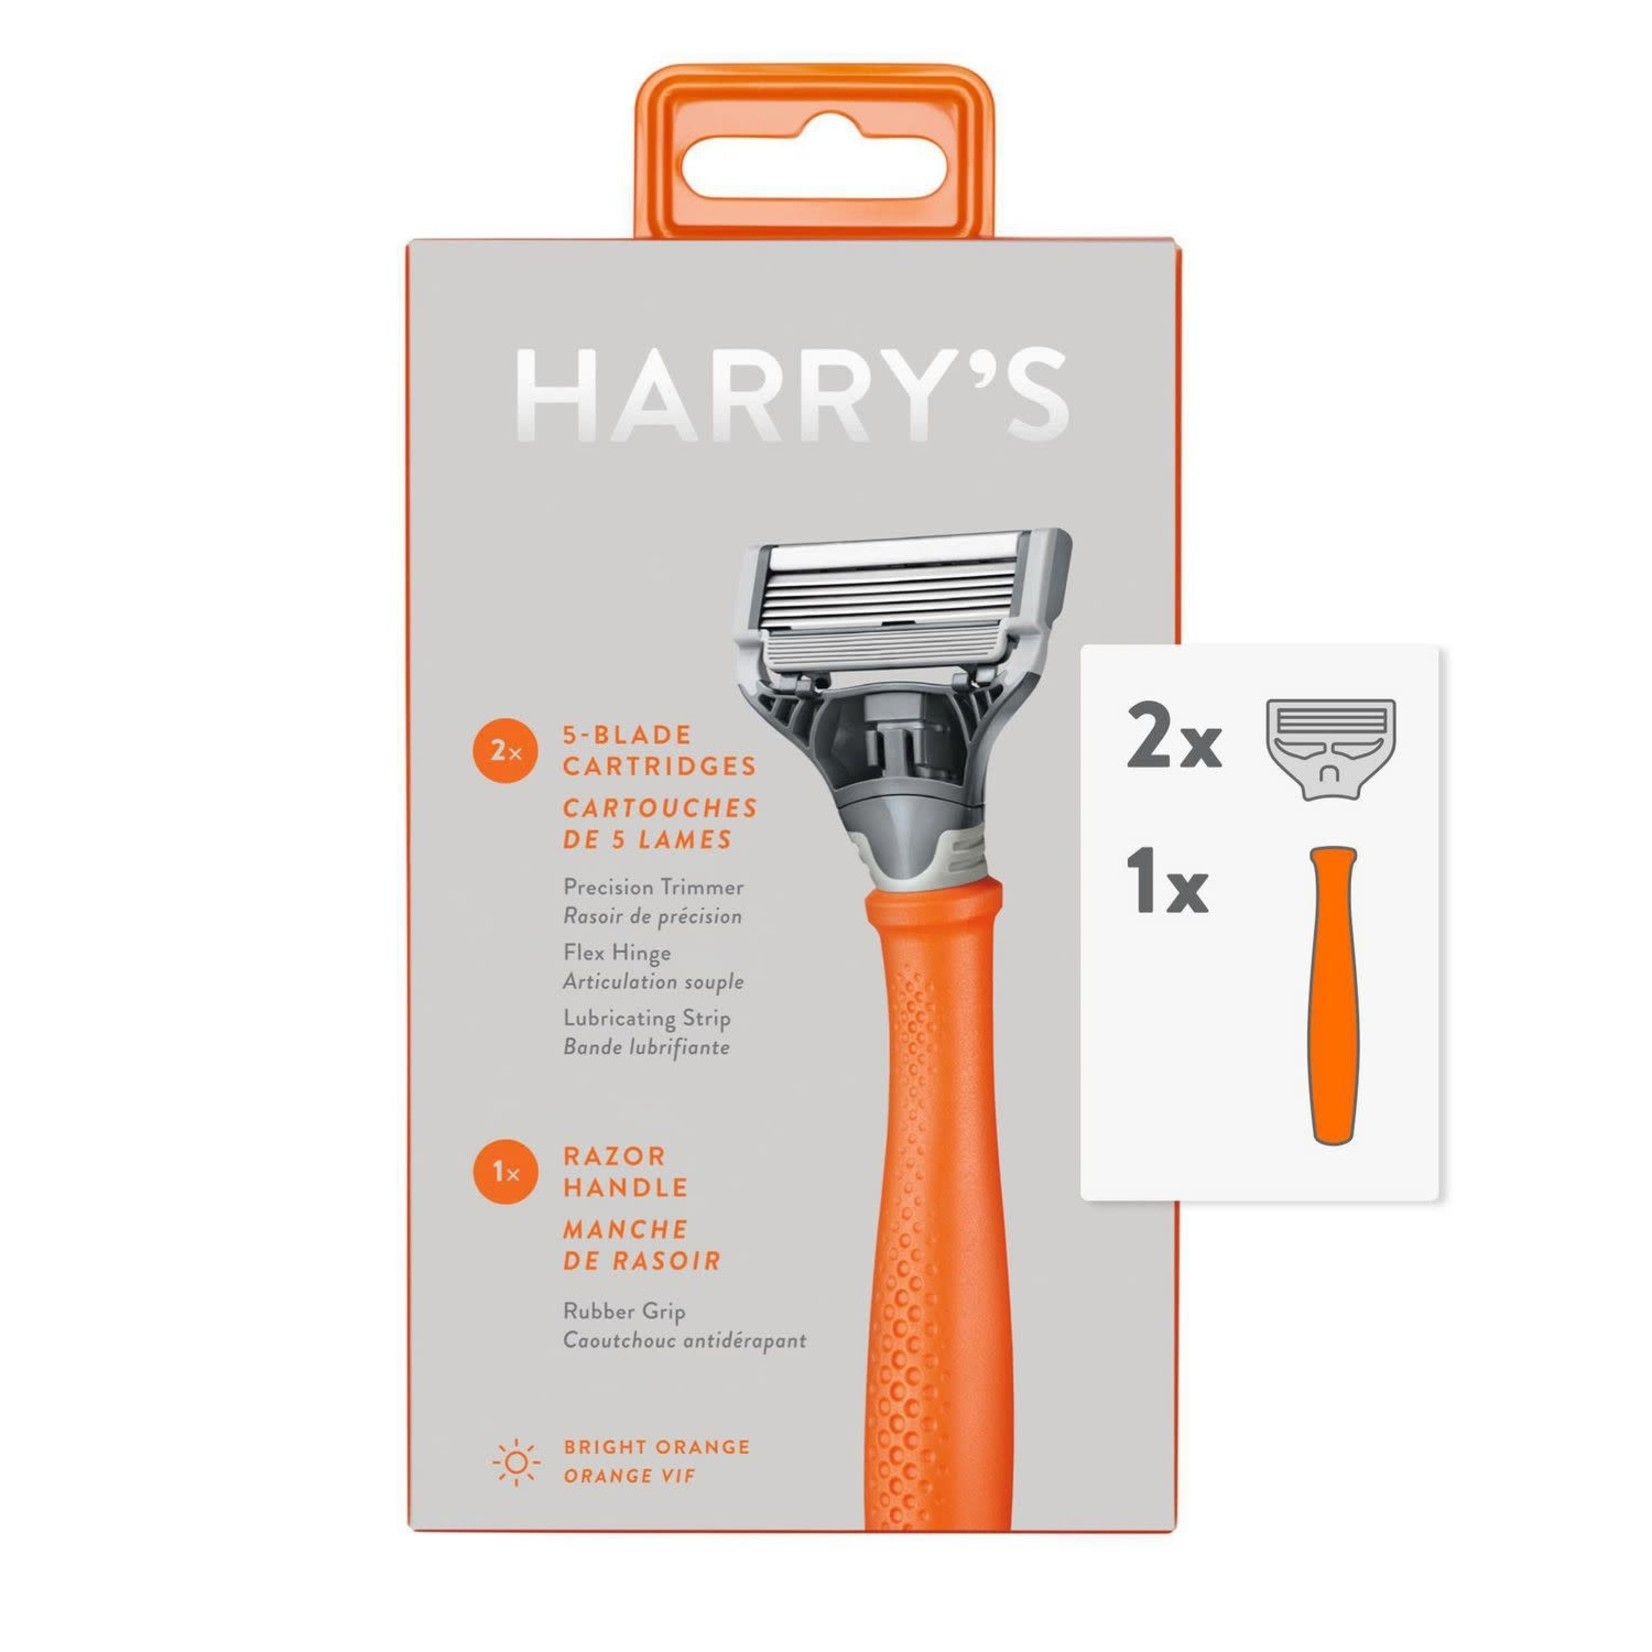 Harry's 5-Blade Men's Razor – 1 Razor Handle + 2 Razor Blade Refills – Bright Orange